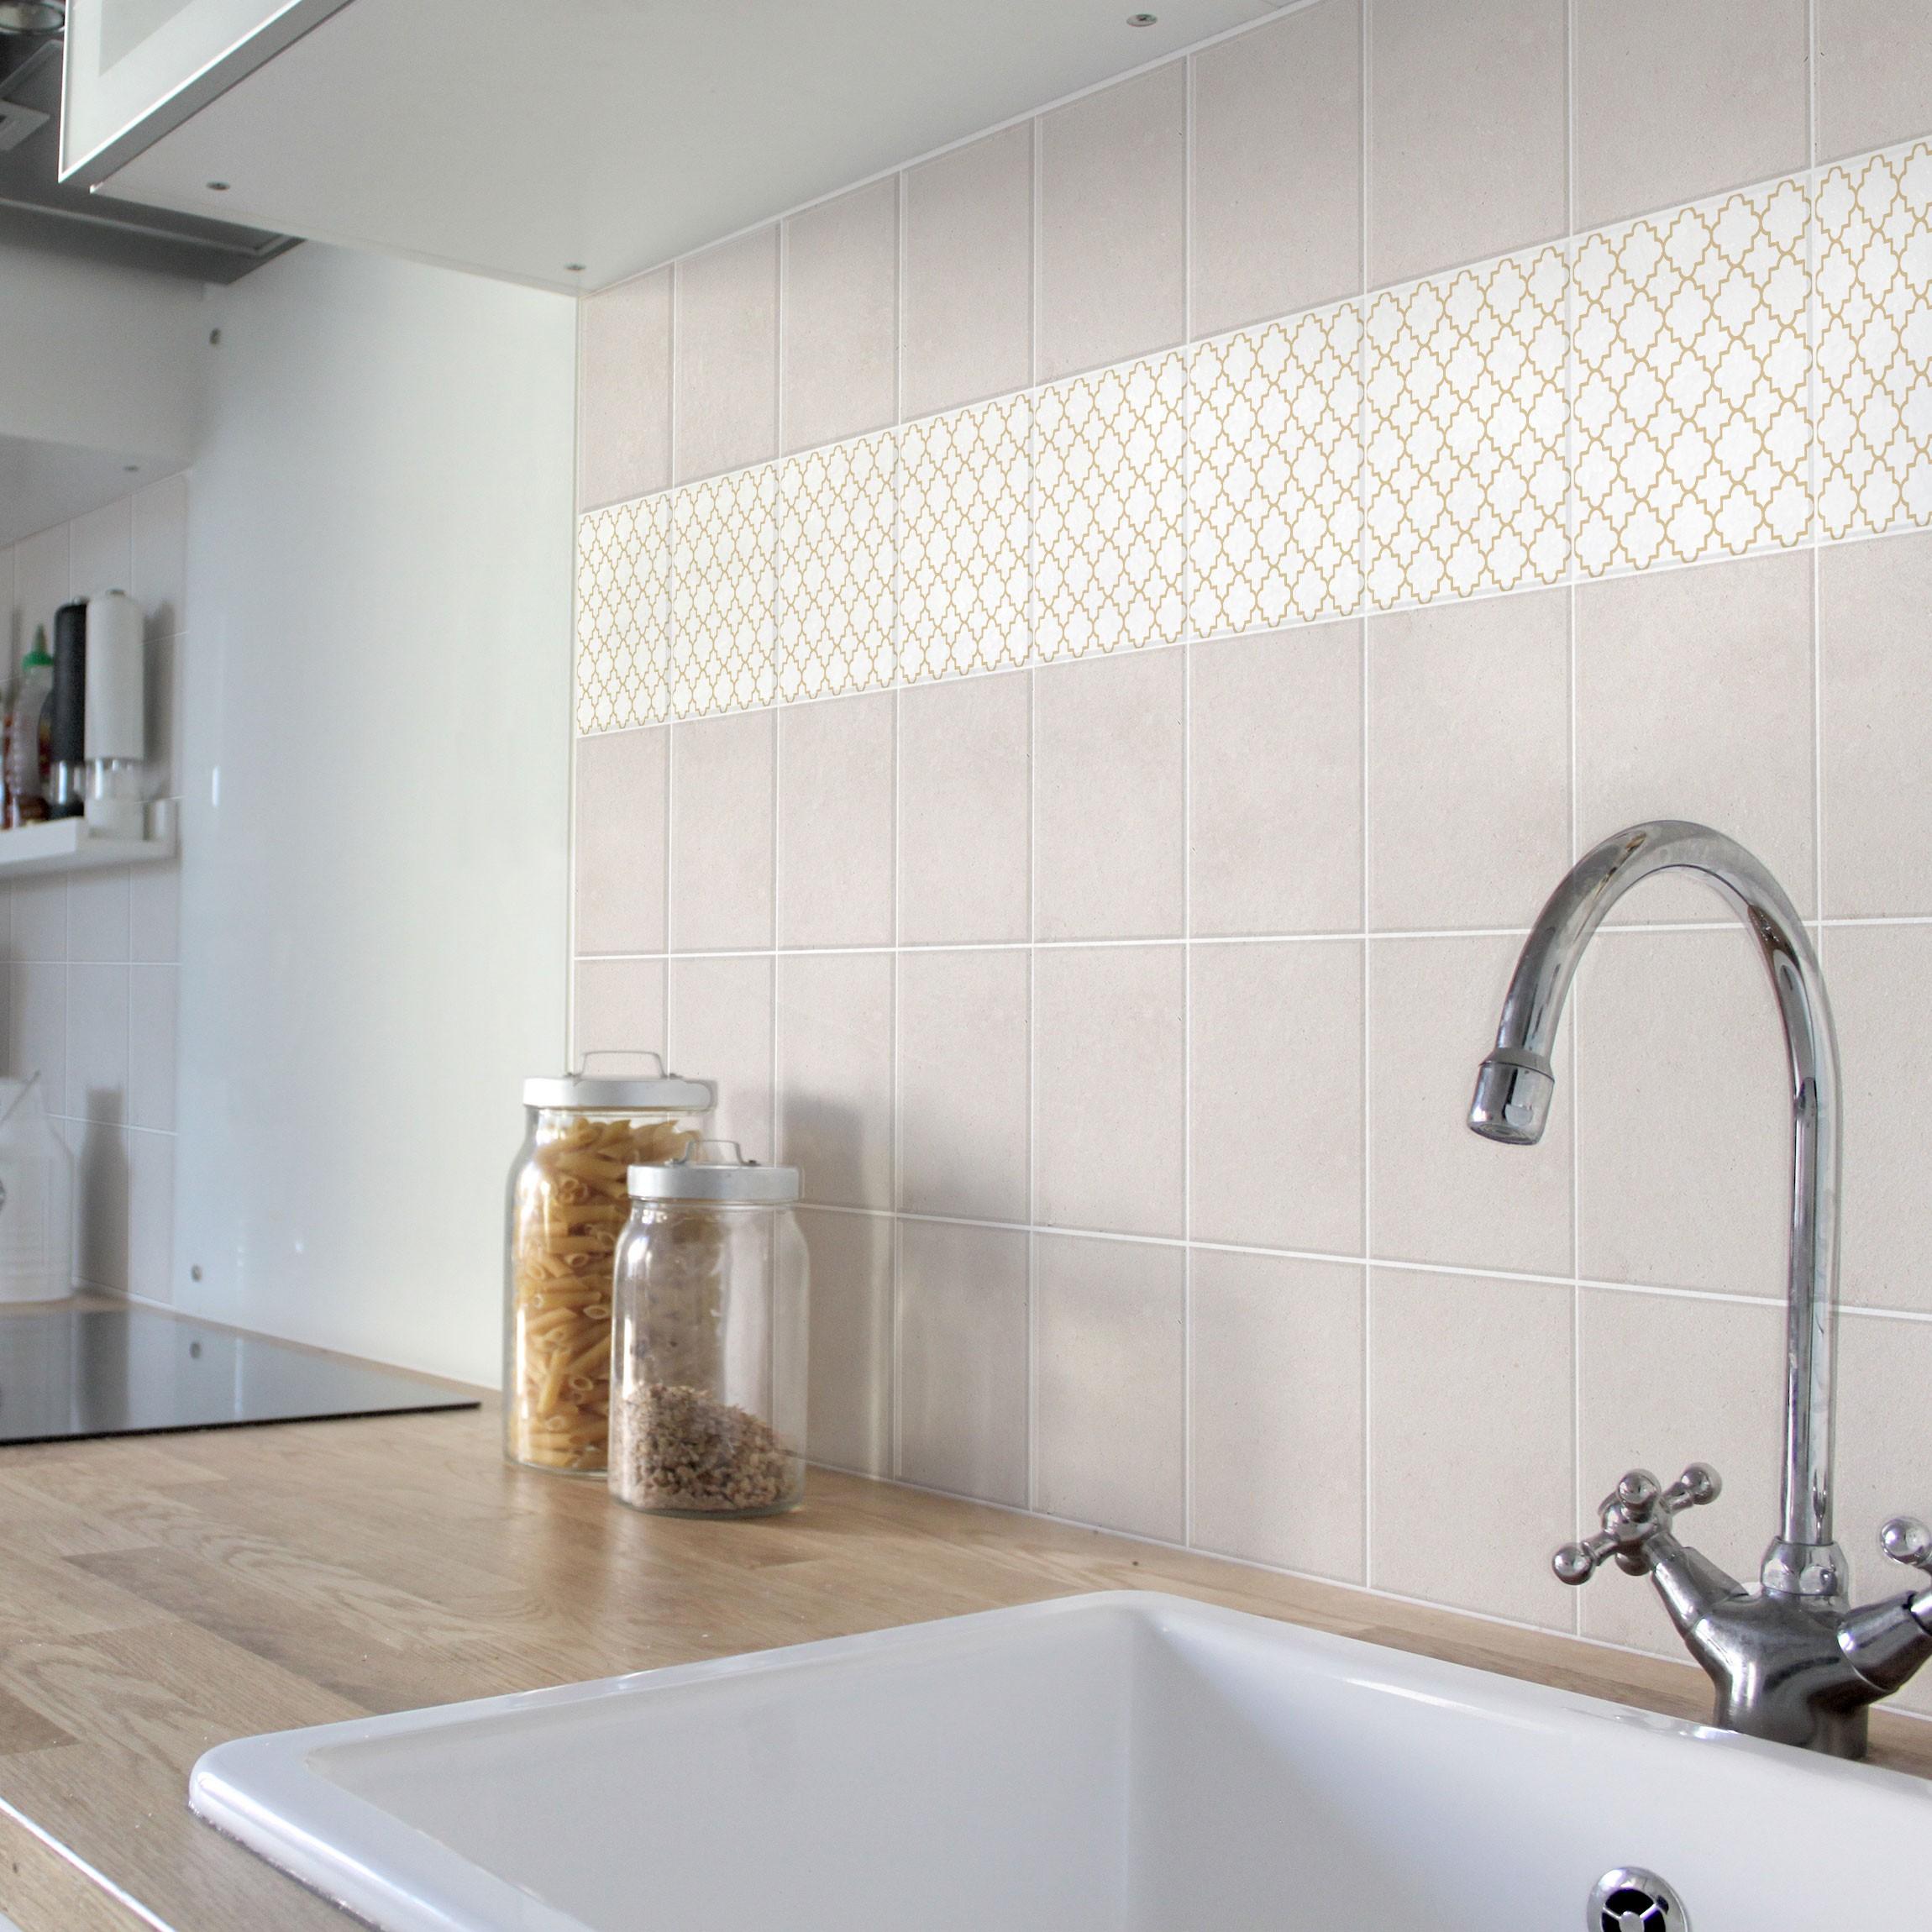 fliesen bord re traditional quatrefoil white light brown 10x10 cm fliesenaufkleber beige. Black Bedroom Furniture Sets. Home Design Ideas